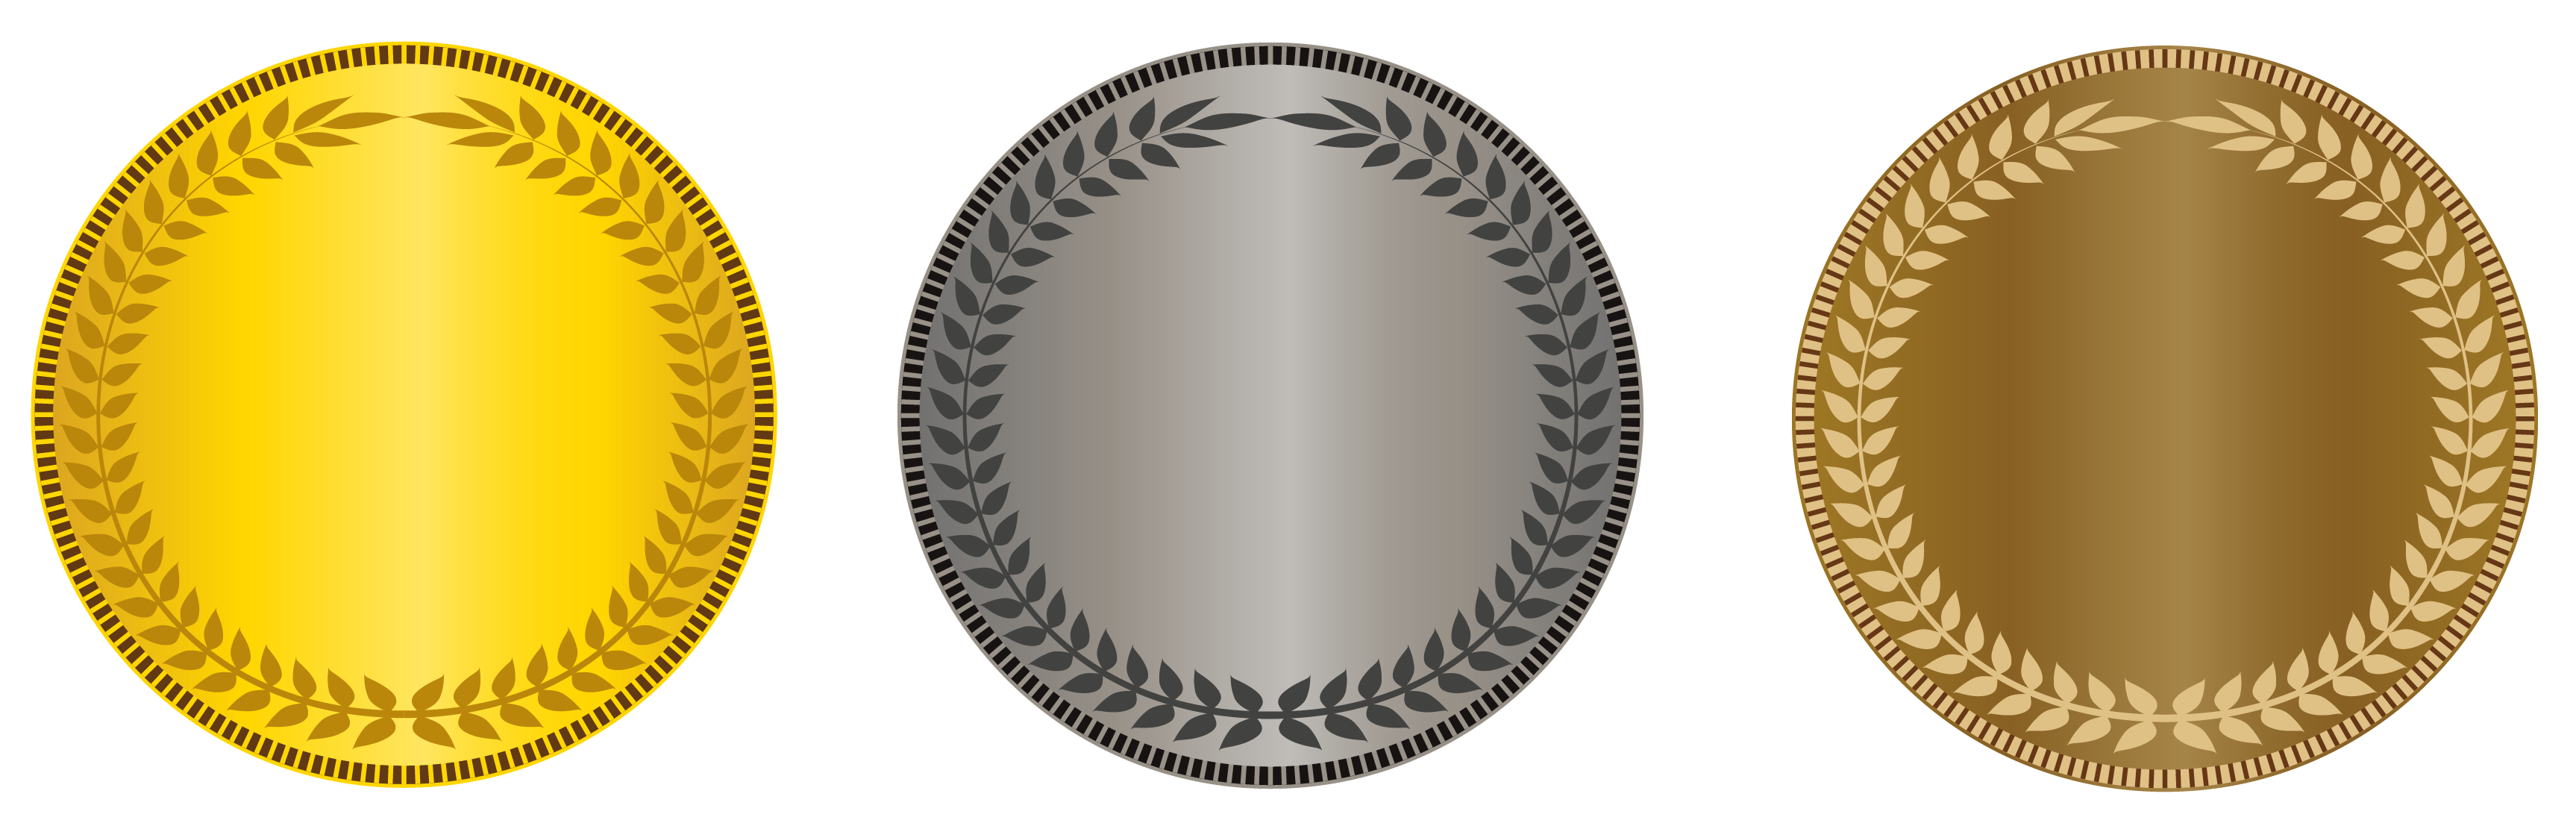 Transparent gold silver bronze. Karate clipart medal